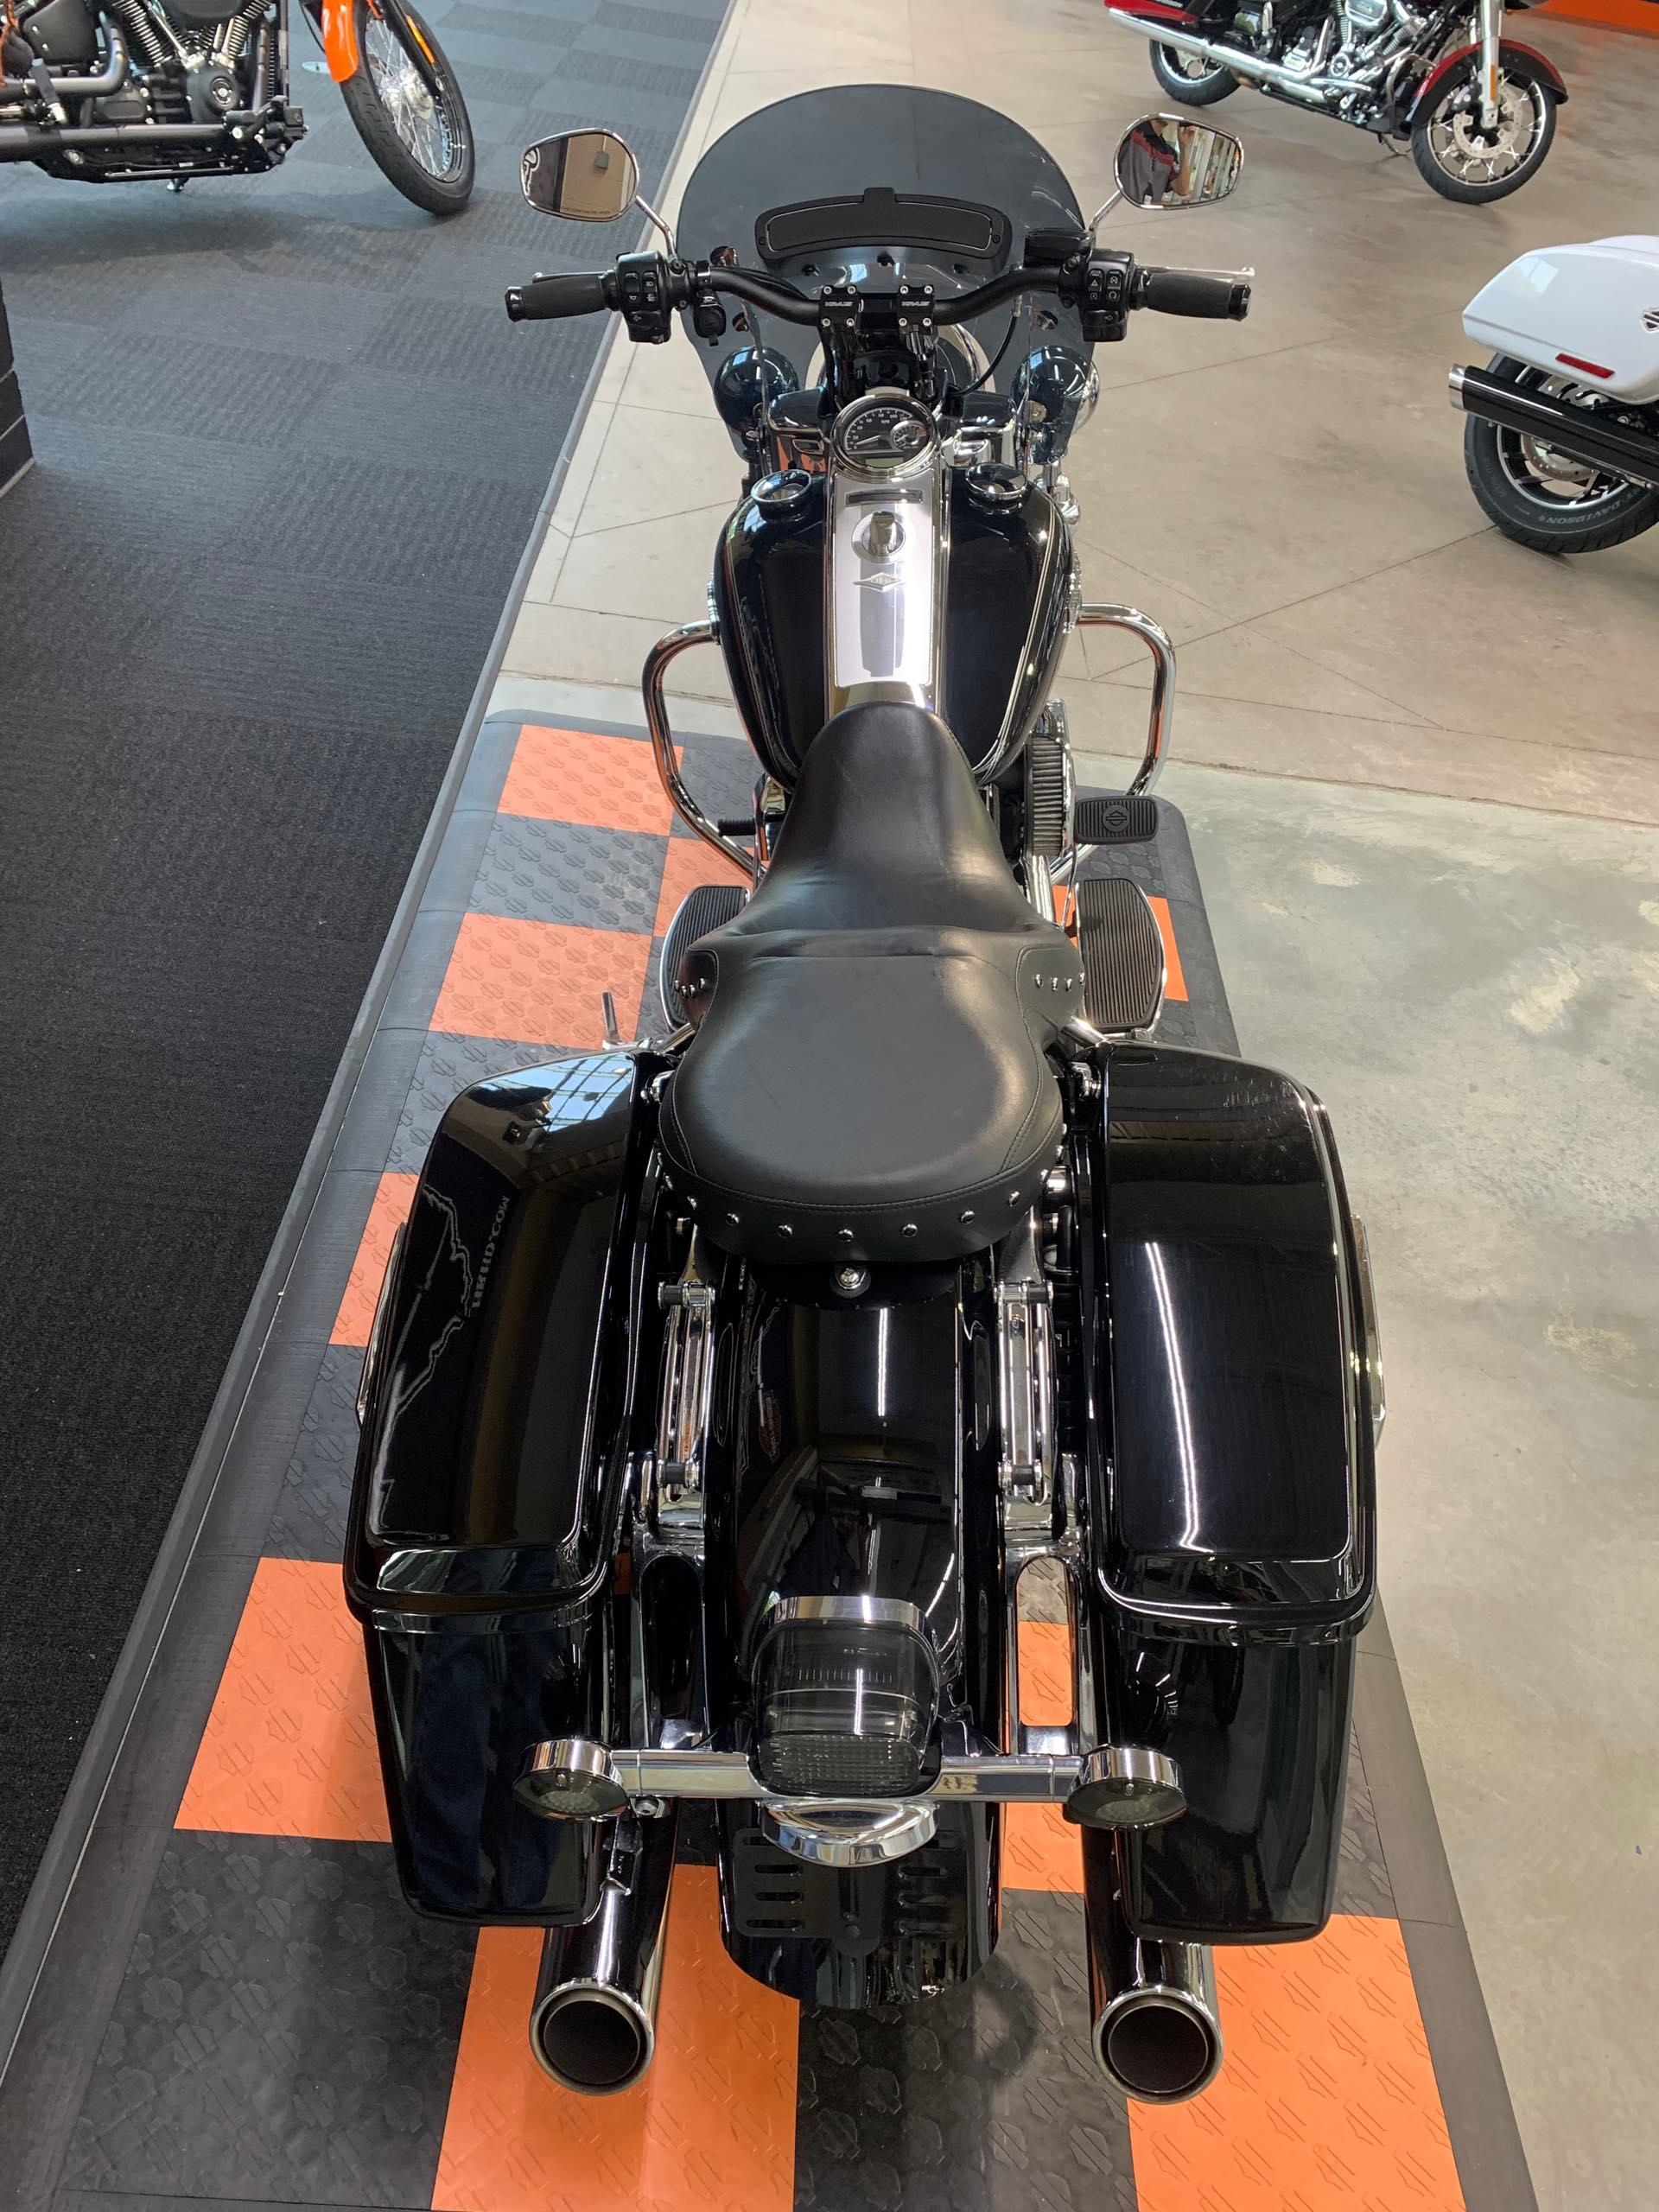 2015 Harley-Davidson Road King Base at Hampton Roads Harley-Davidson